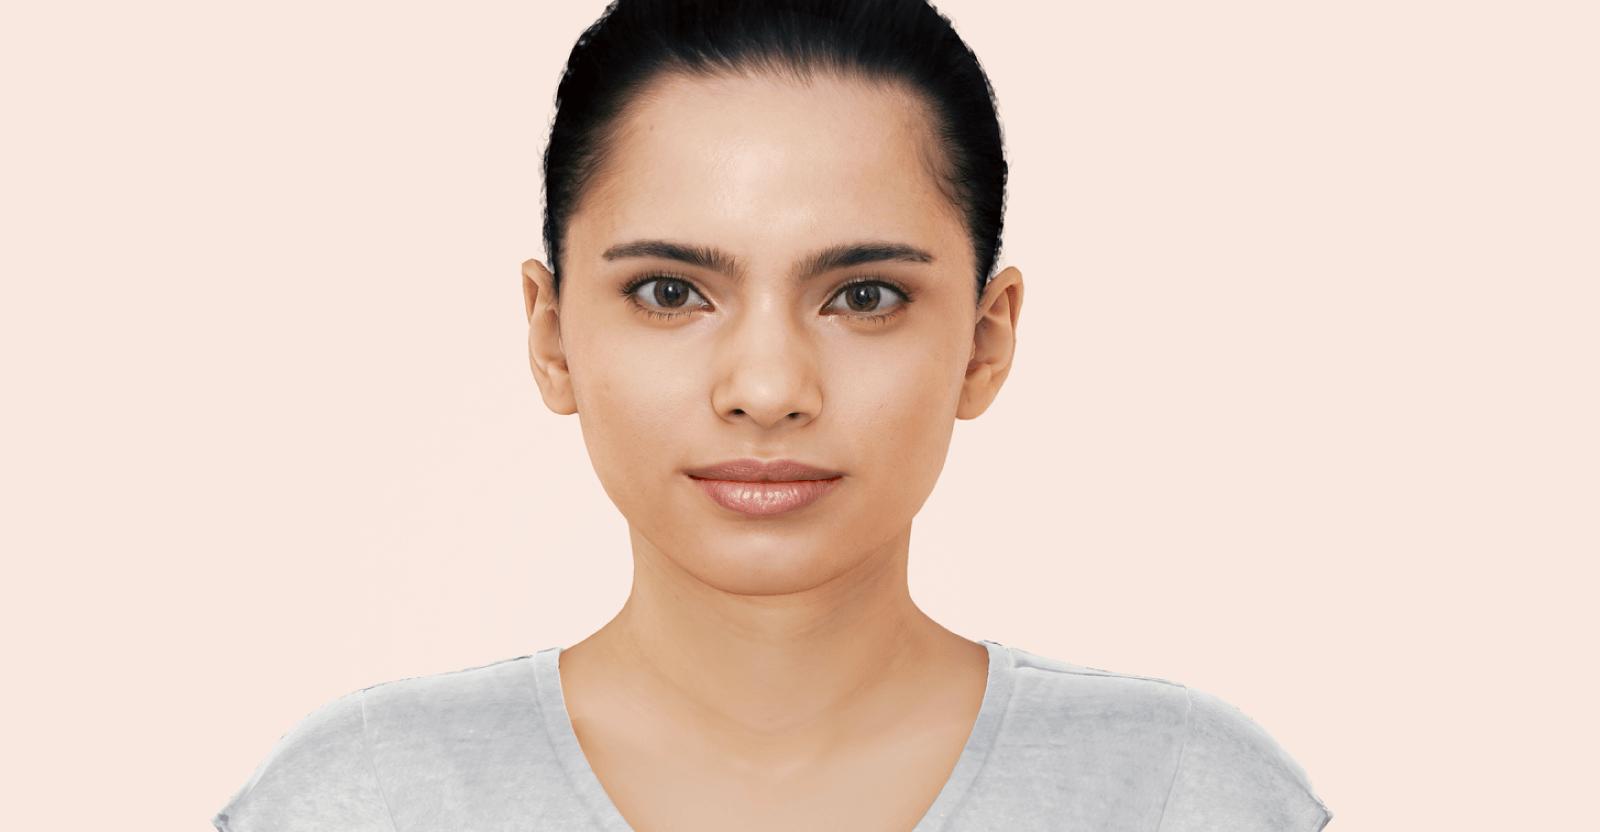 3d model of a woman's face